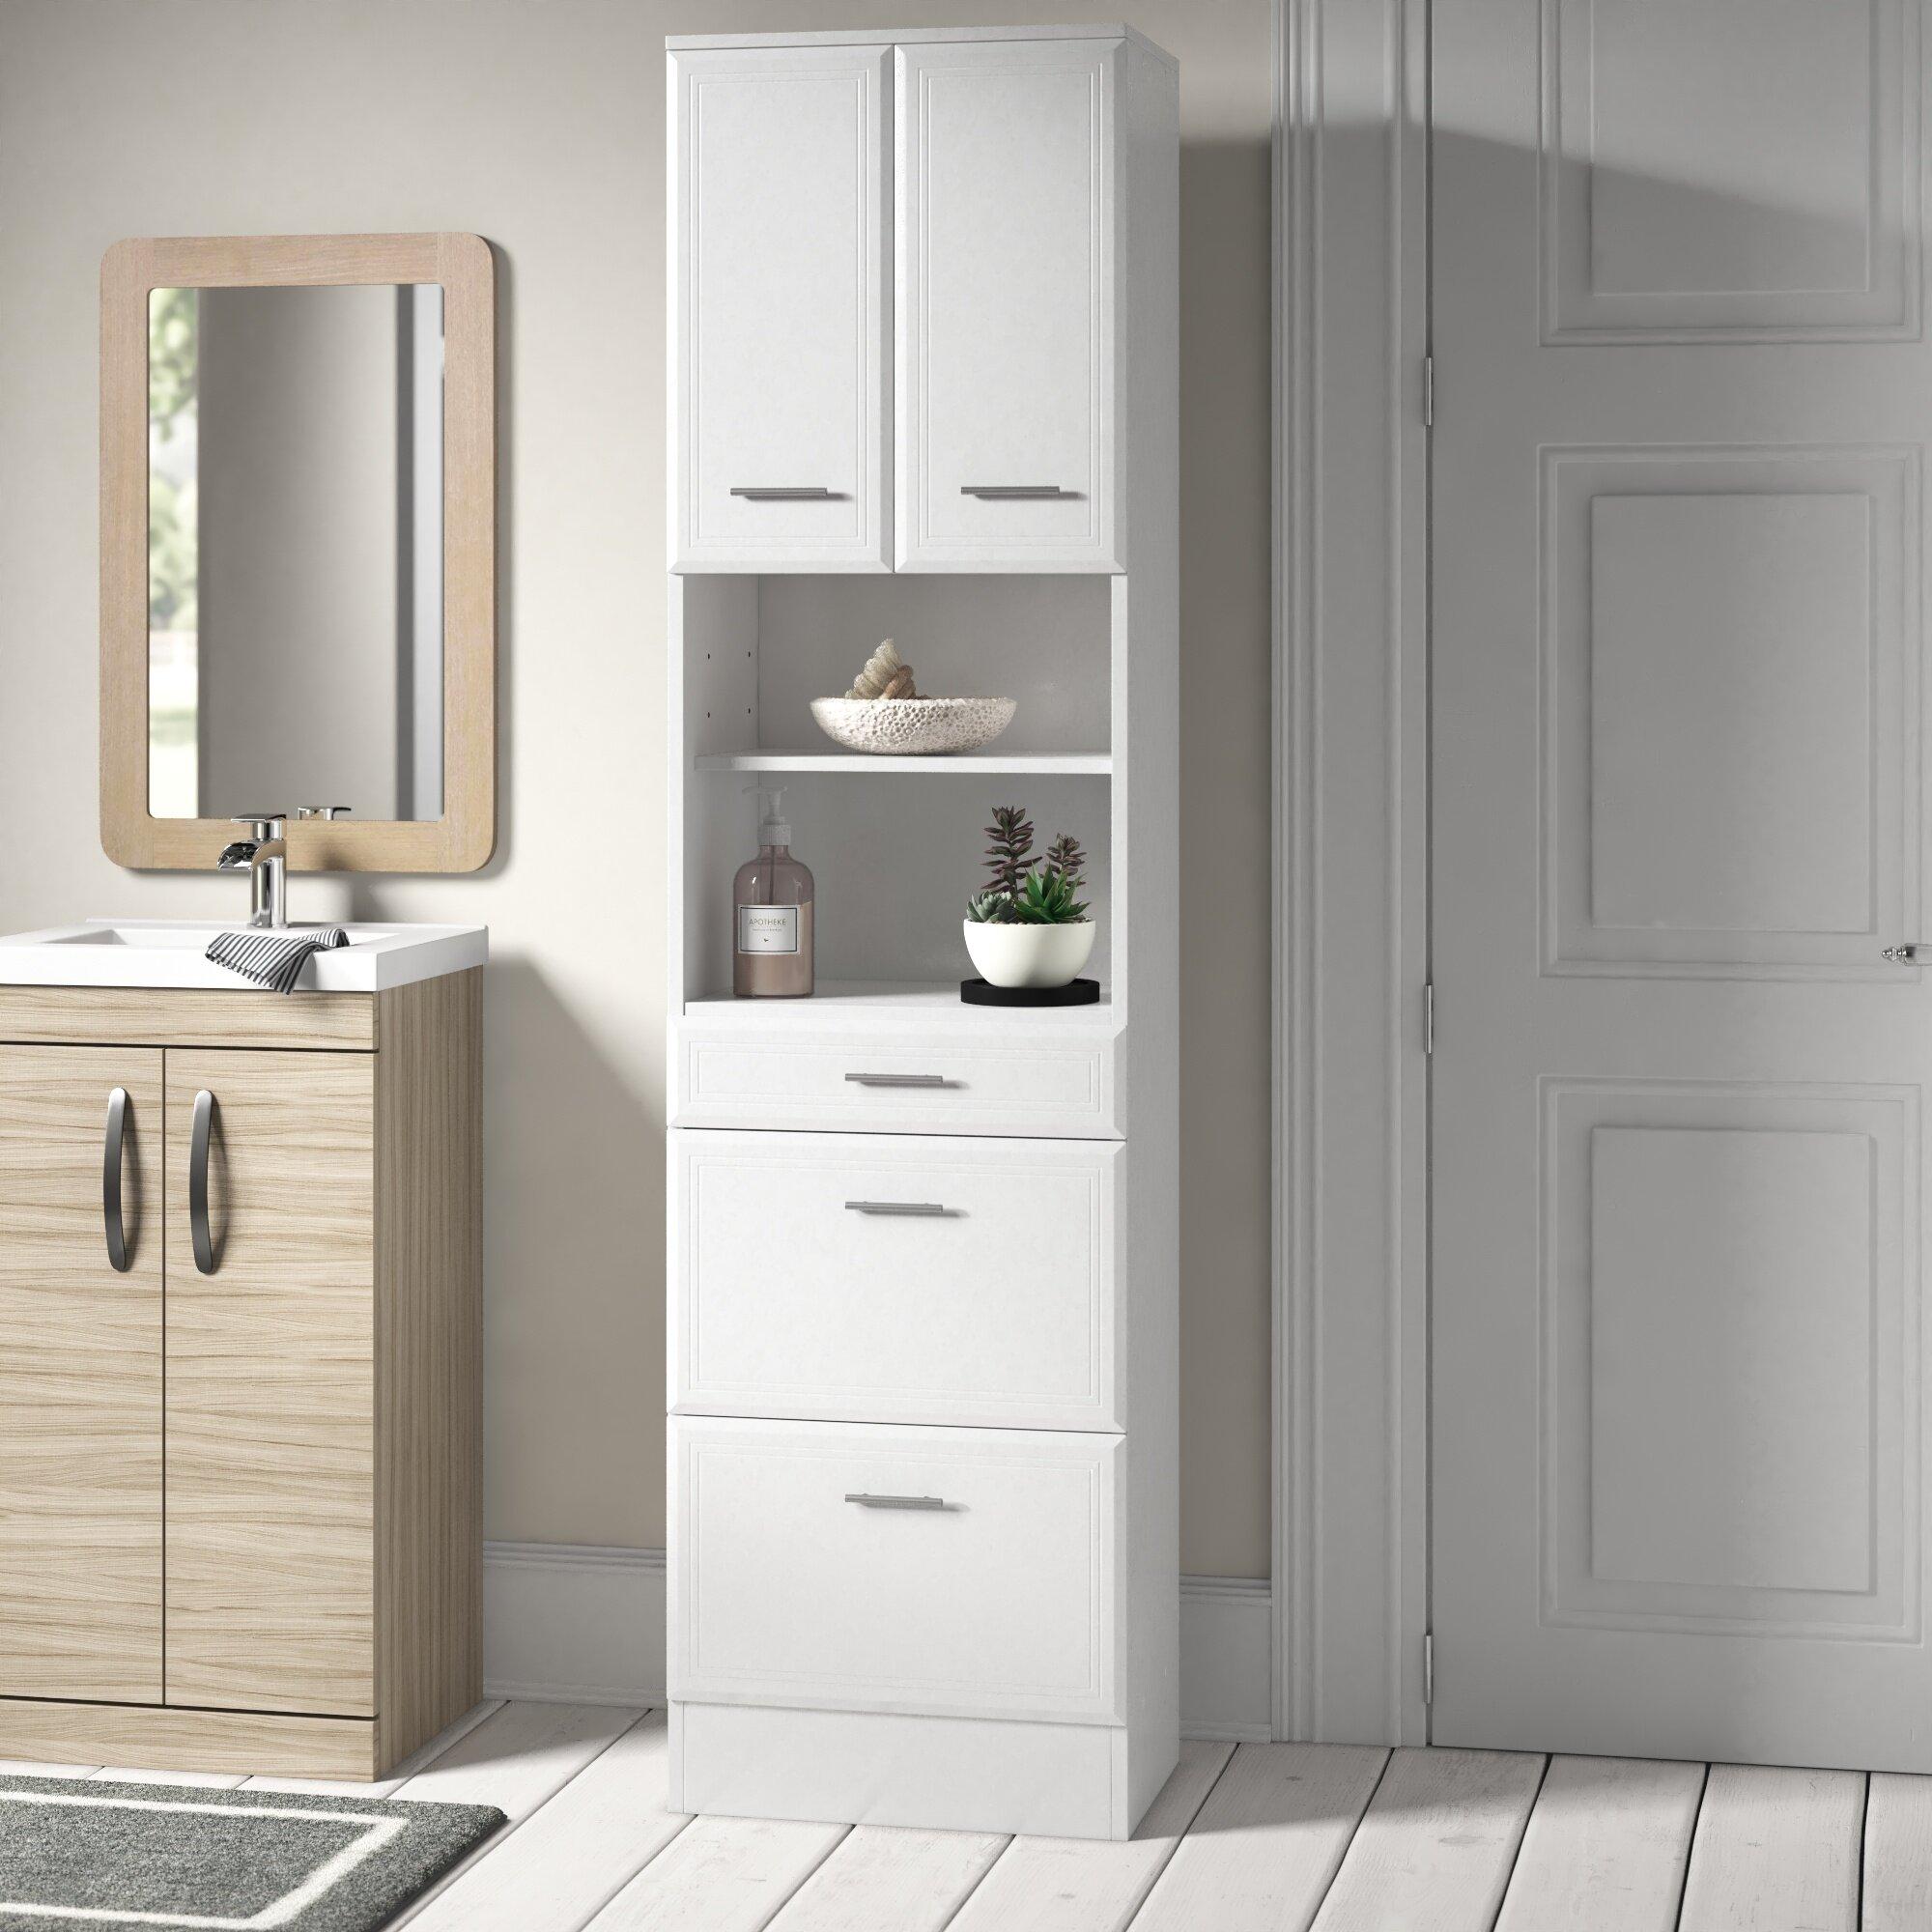 Tysen 4 x 4cm Tall Bathroom Cabinet